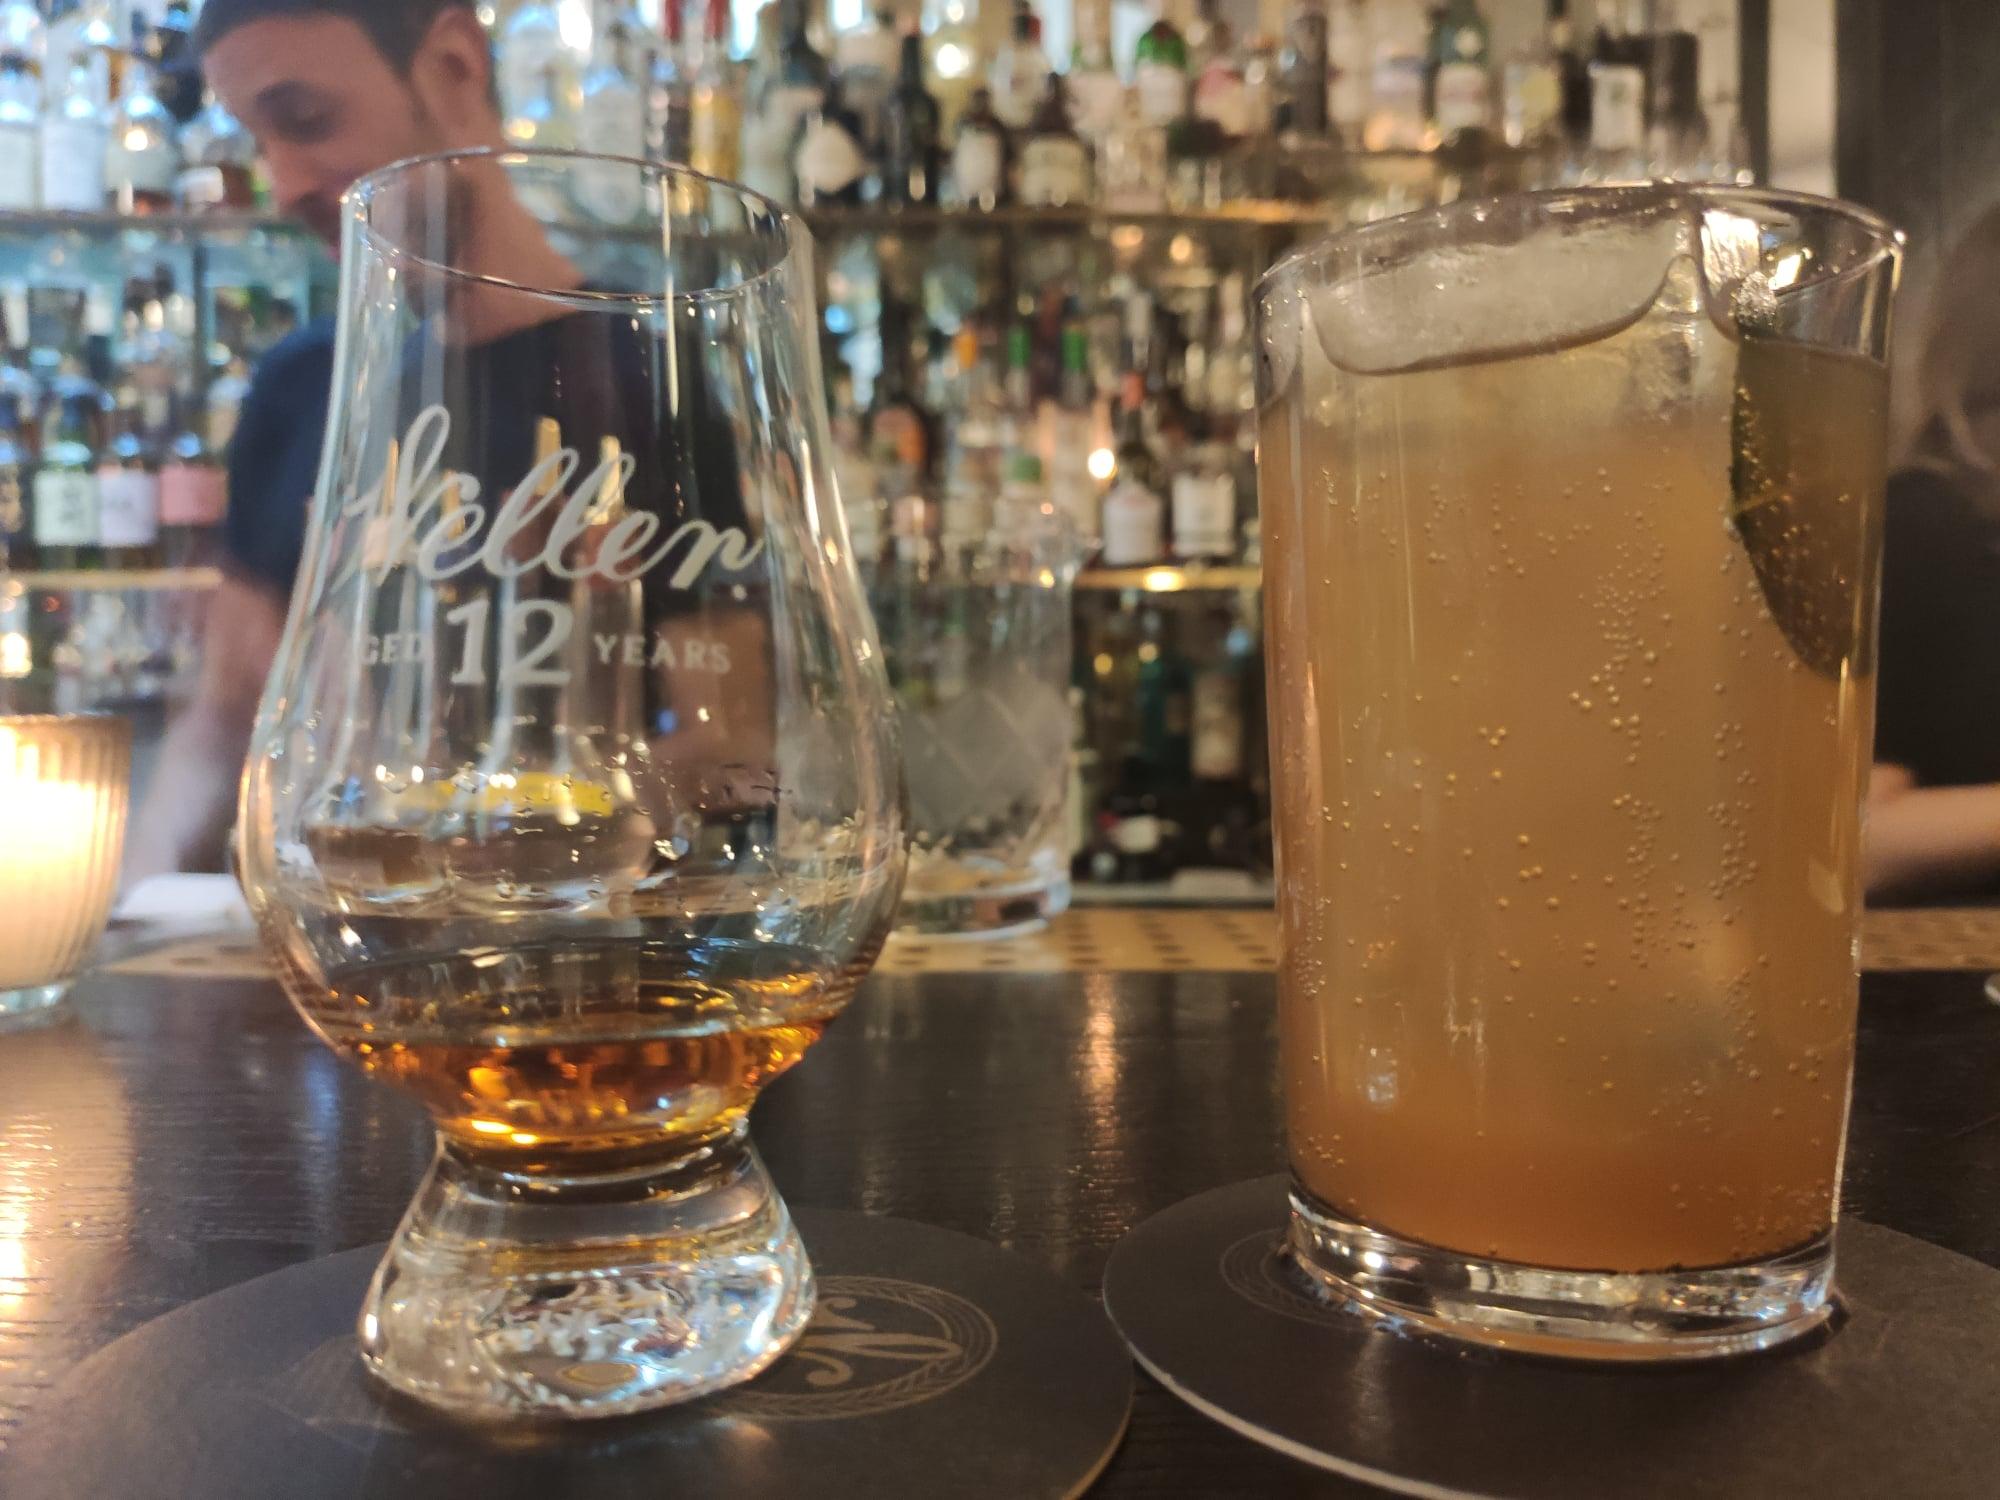 Cocktail Peach, Pleaseeee - Danico (whisky Weller)